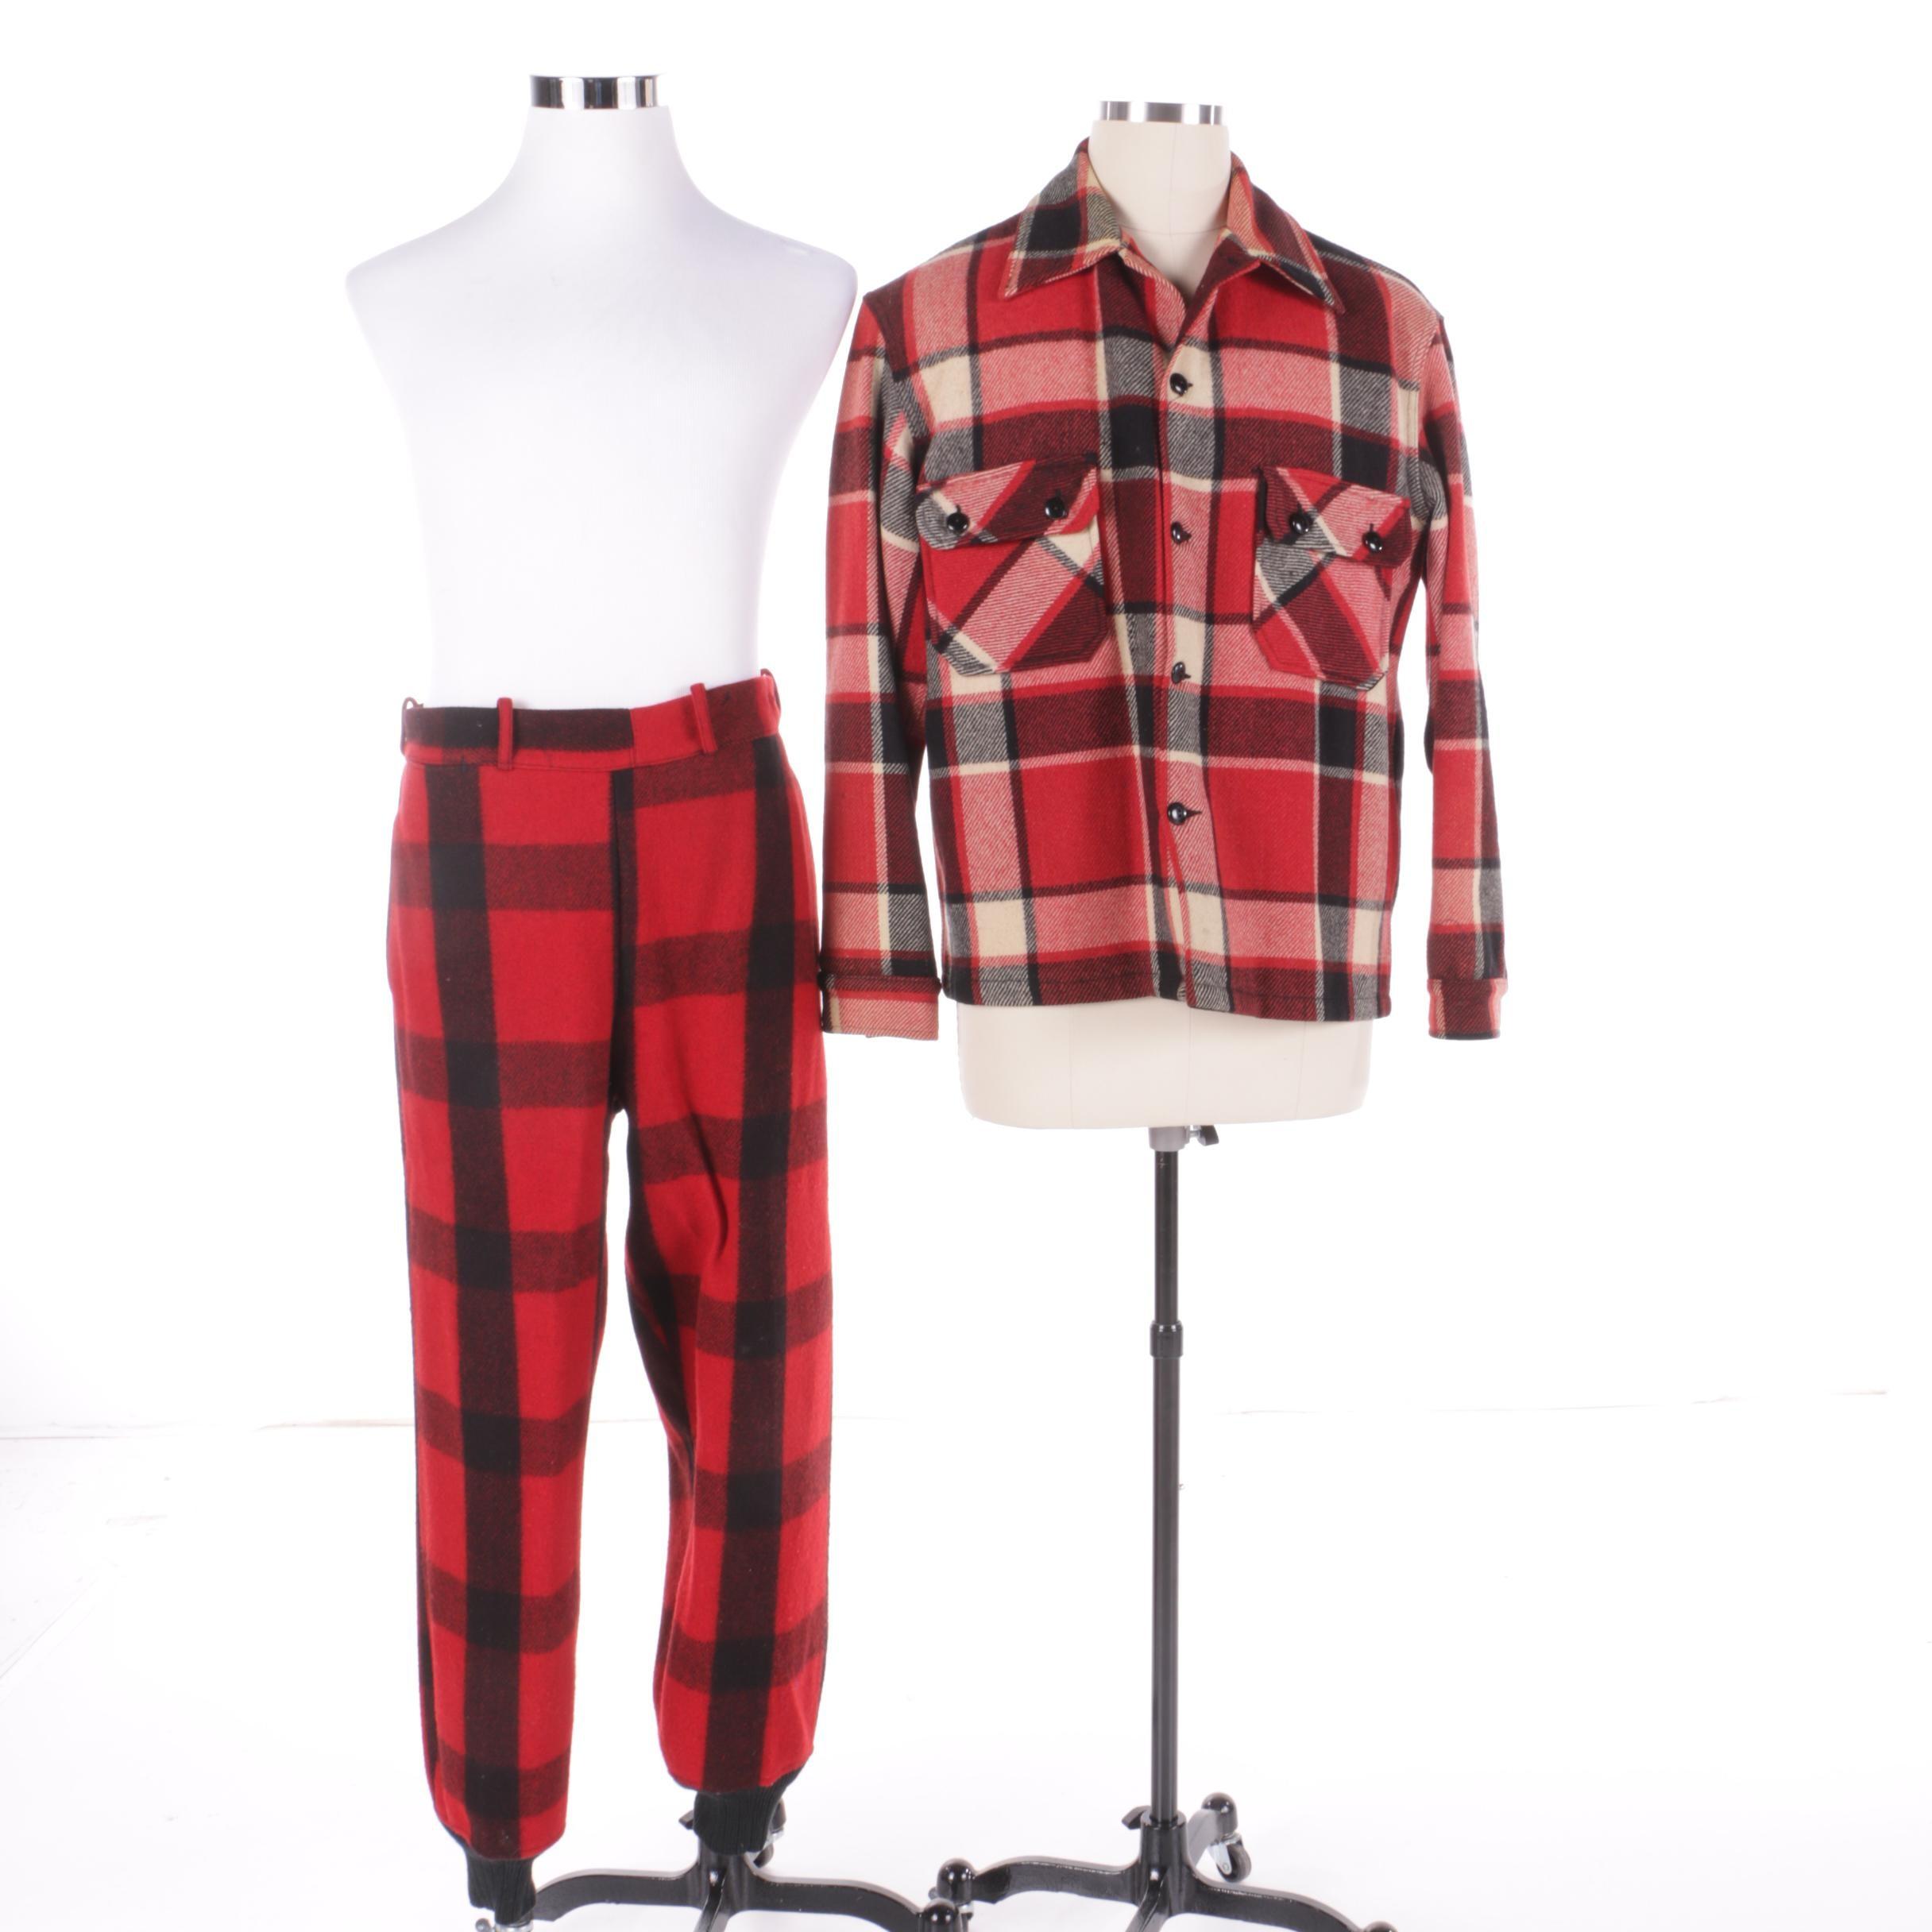 Men's Vintage Wool Plaid Pants and Shirt Including Chippewa